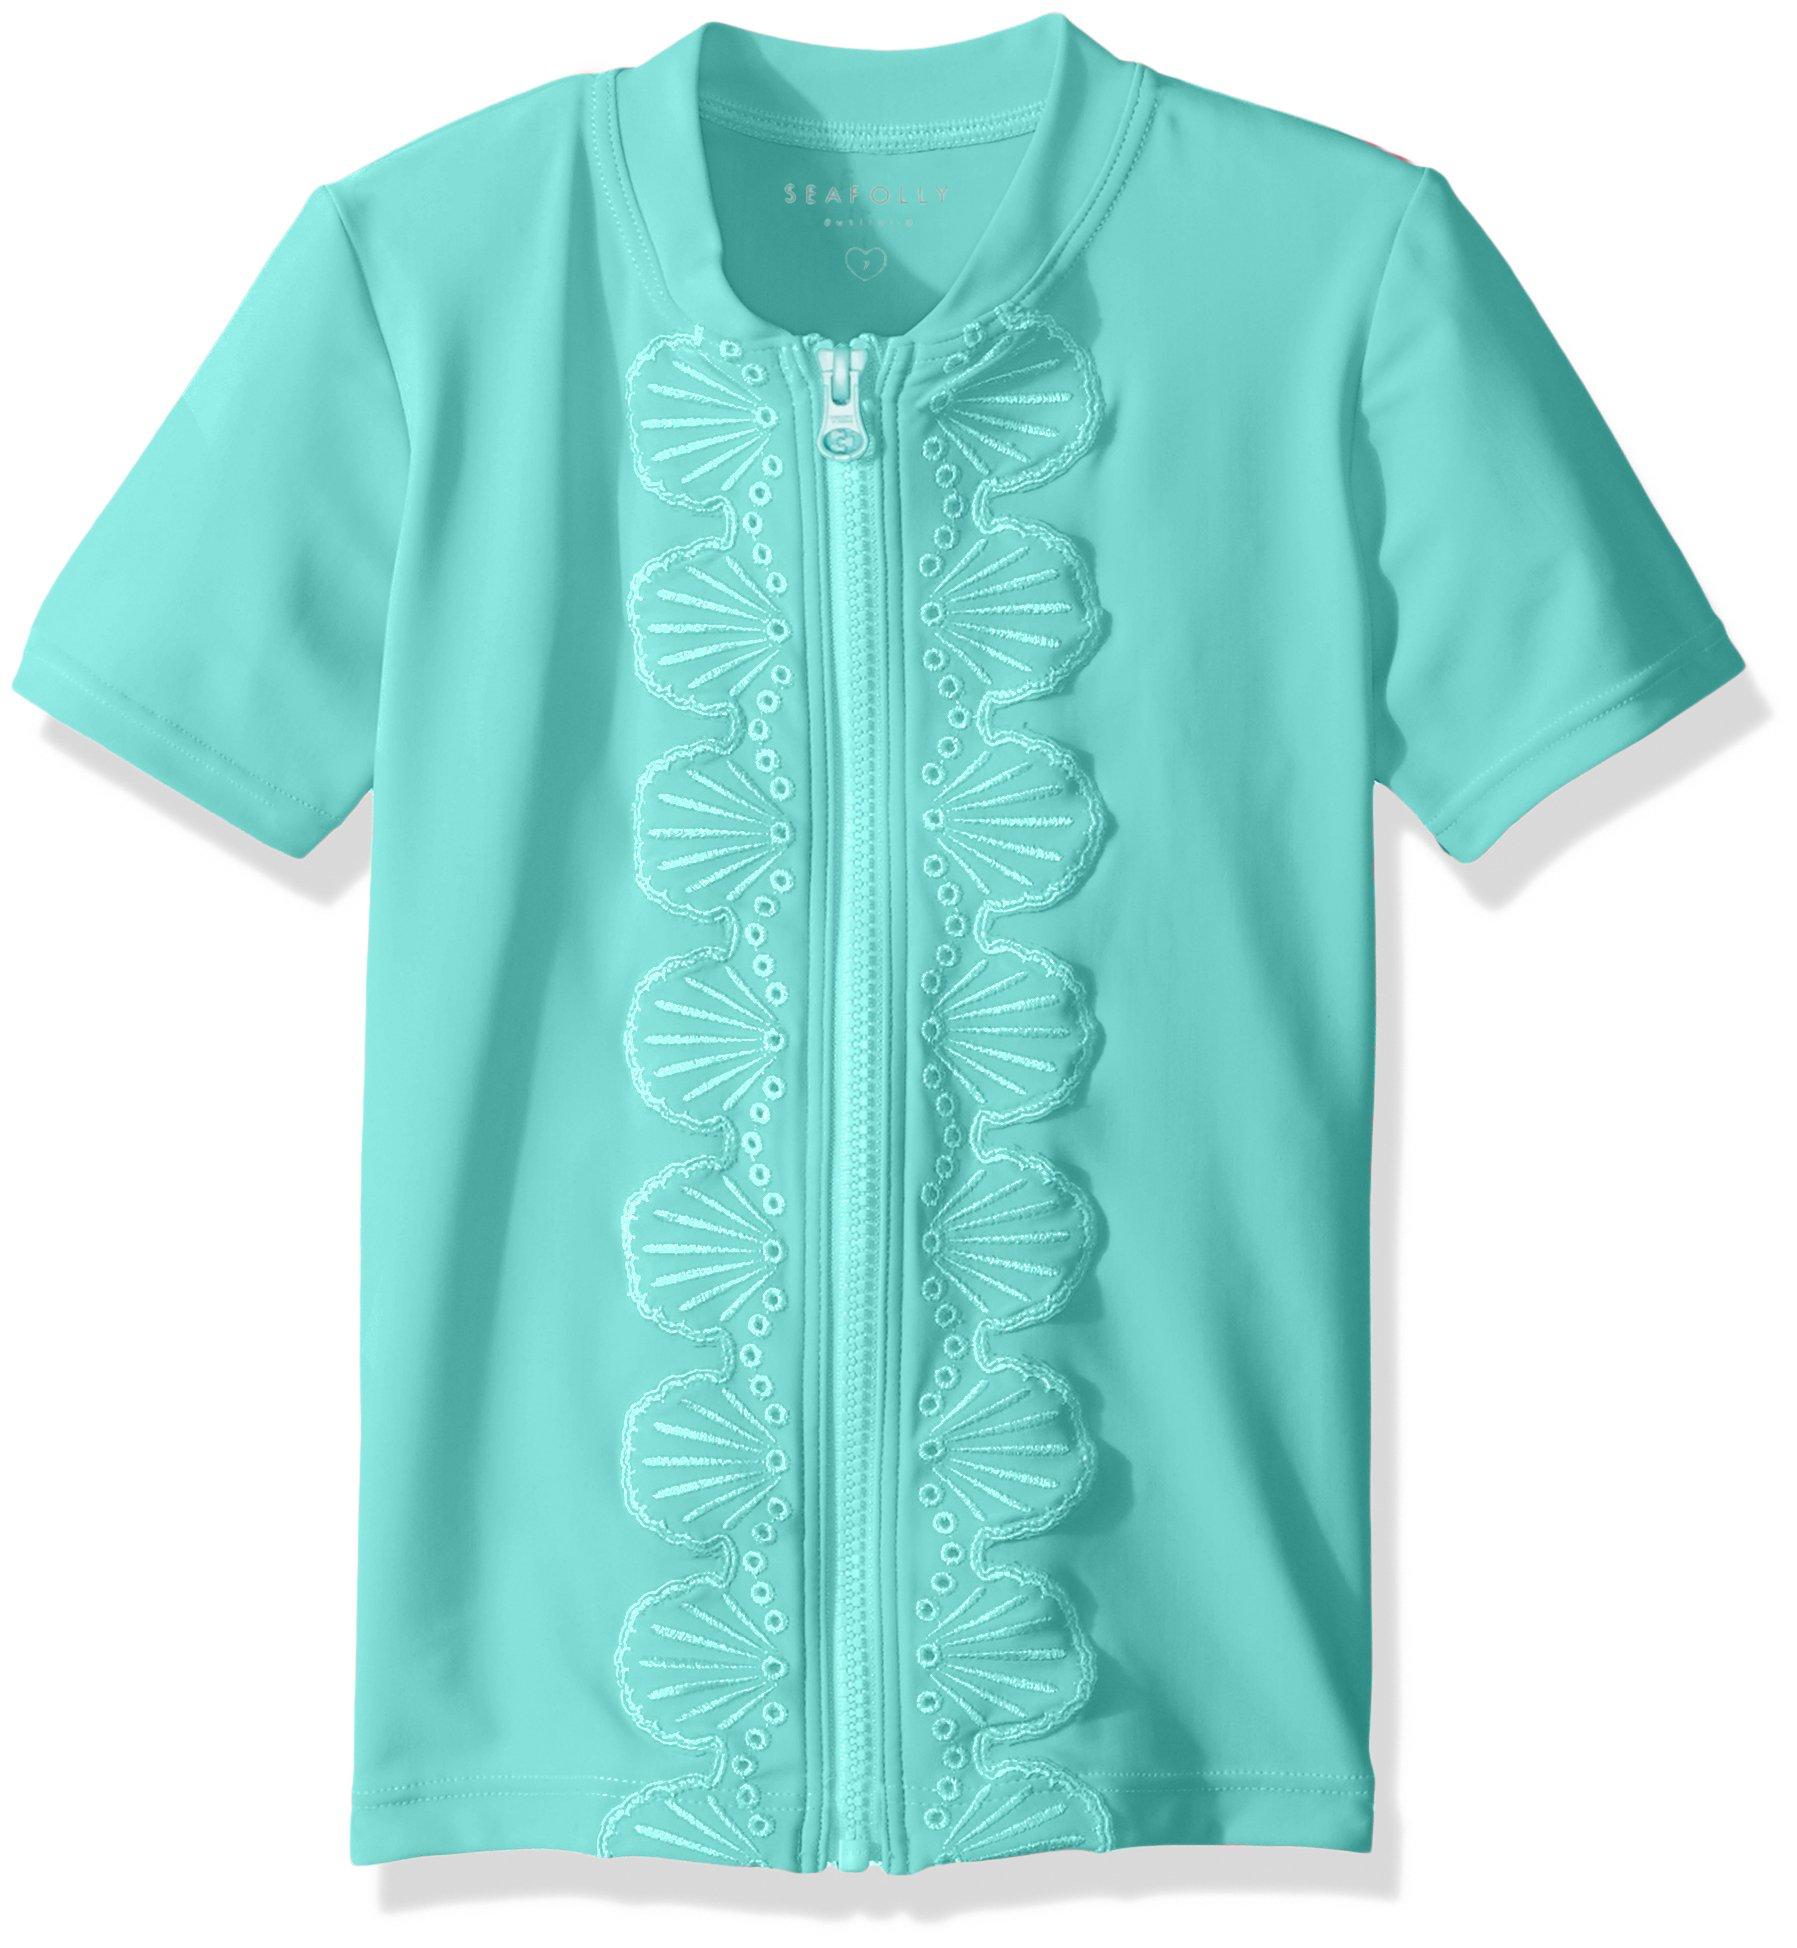 Seafolly Little Girls' Sweet Summer S/s Zip Front Swimsuit Rashguard, Bahama Blue, 6